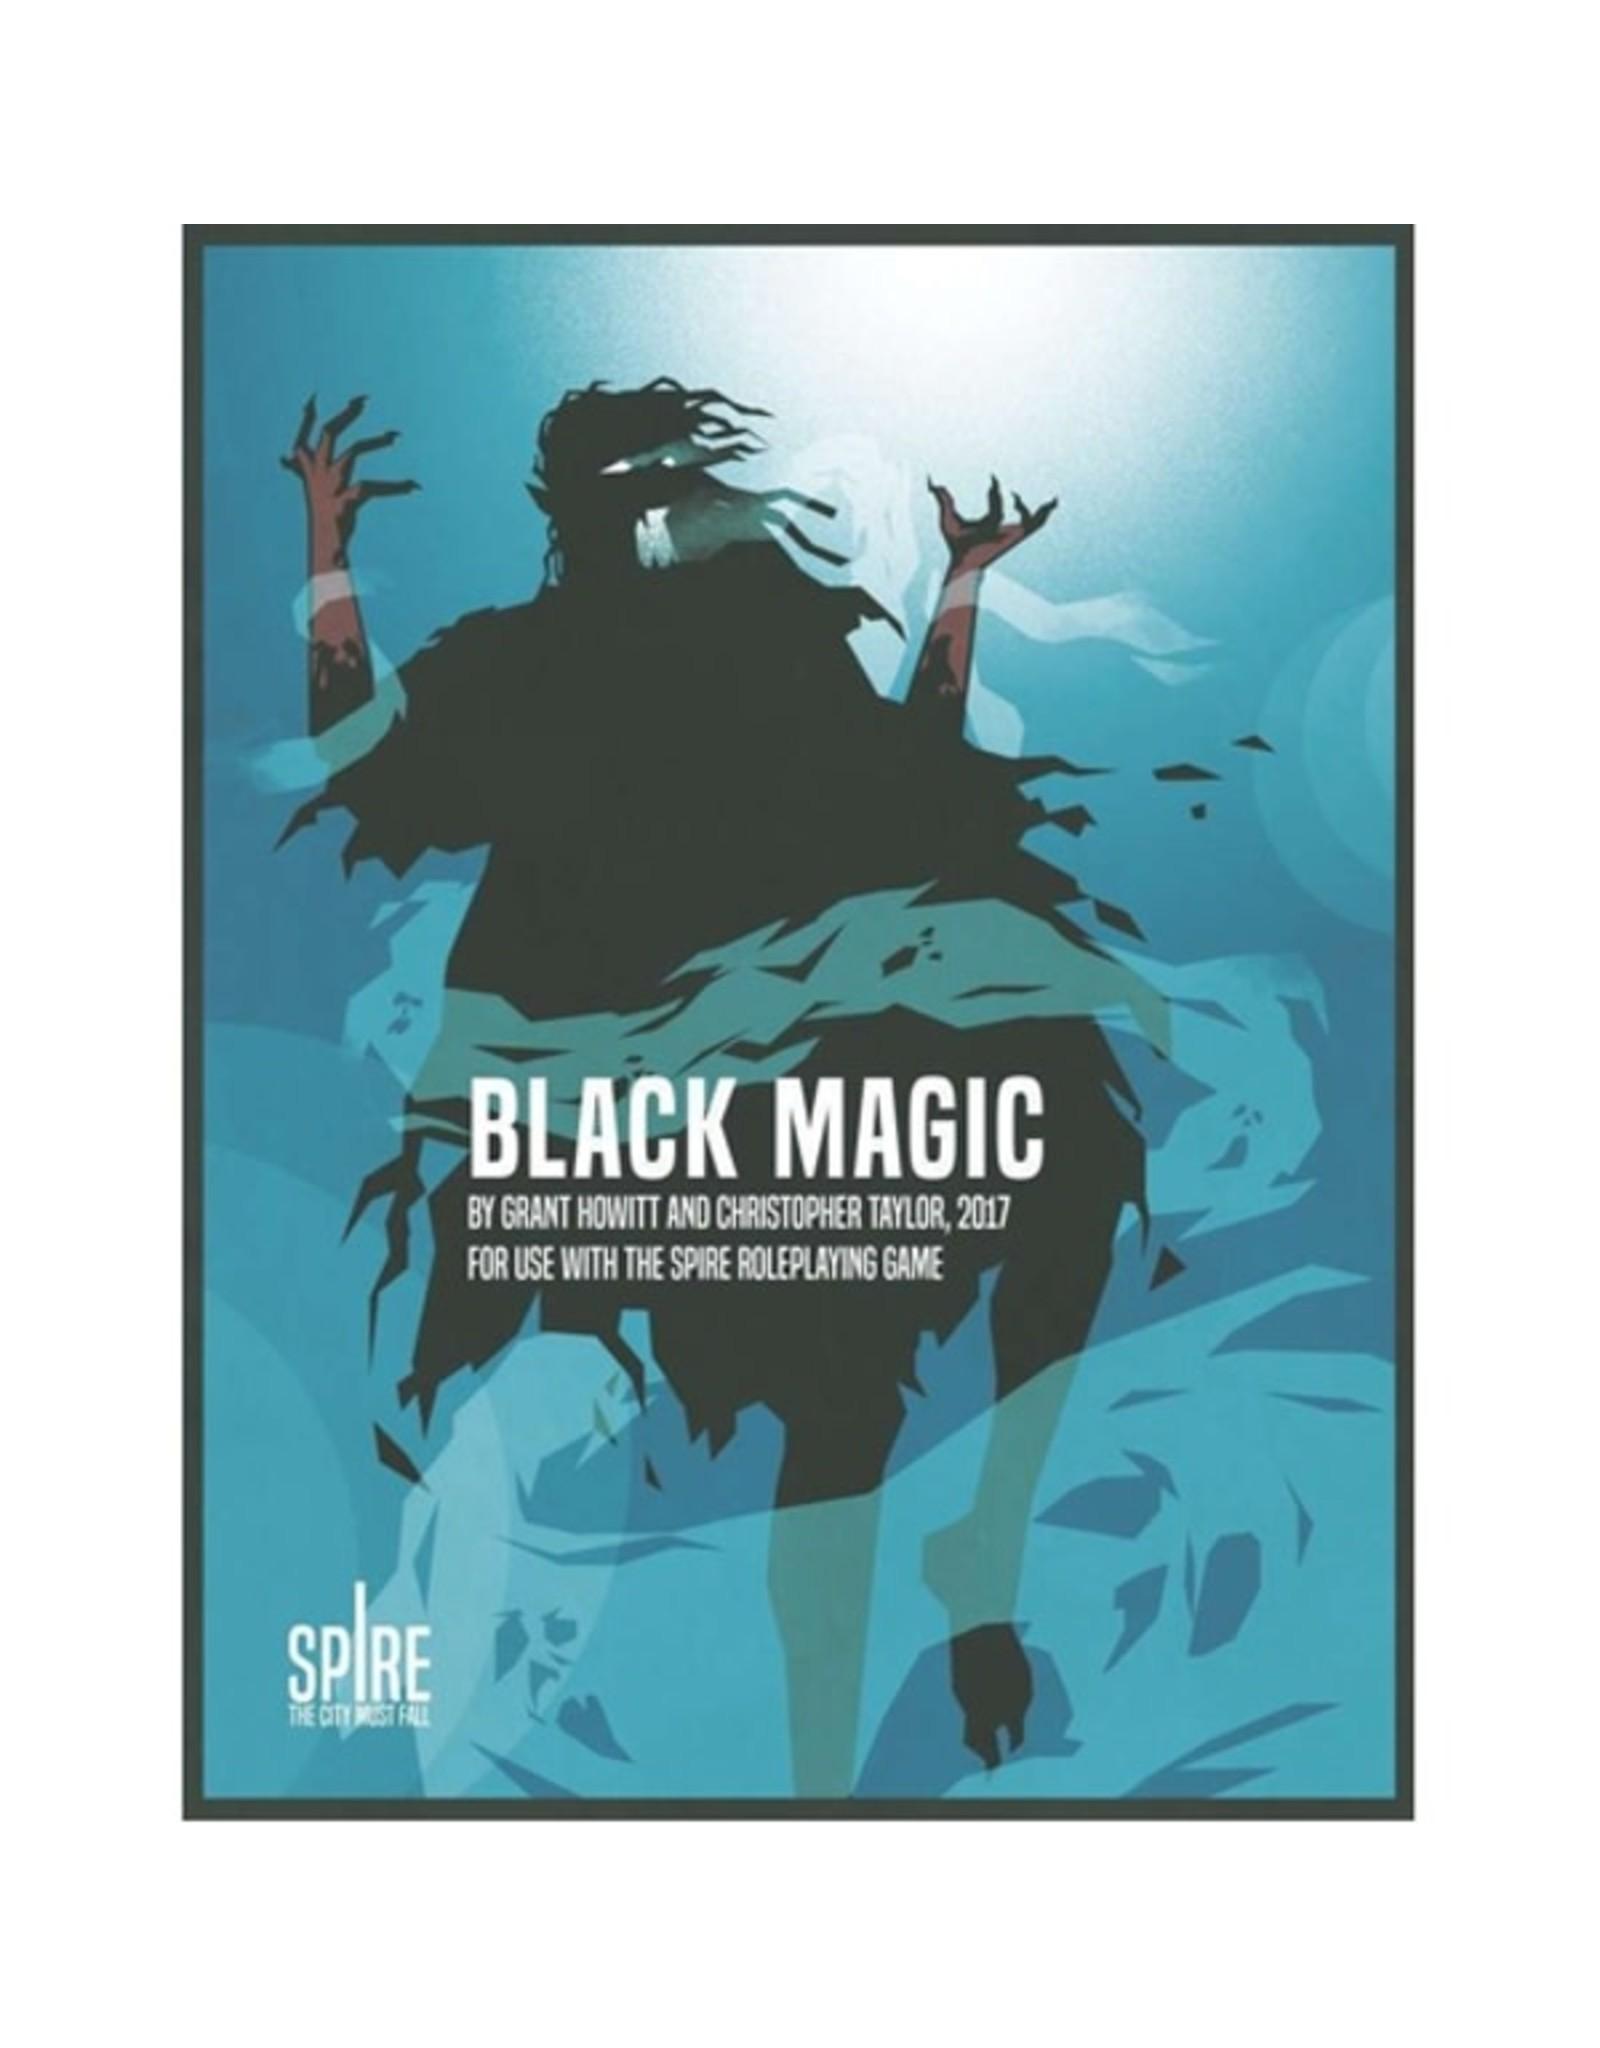 Rowan, Rook, and Decard BLACK MAGIC